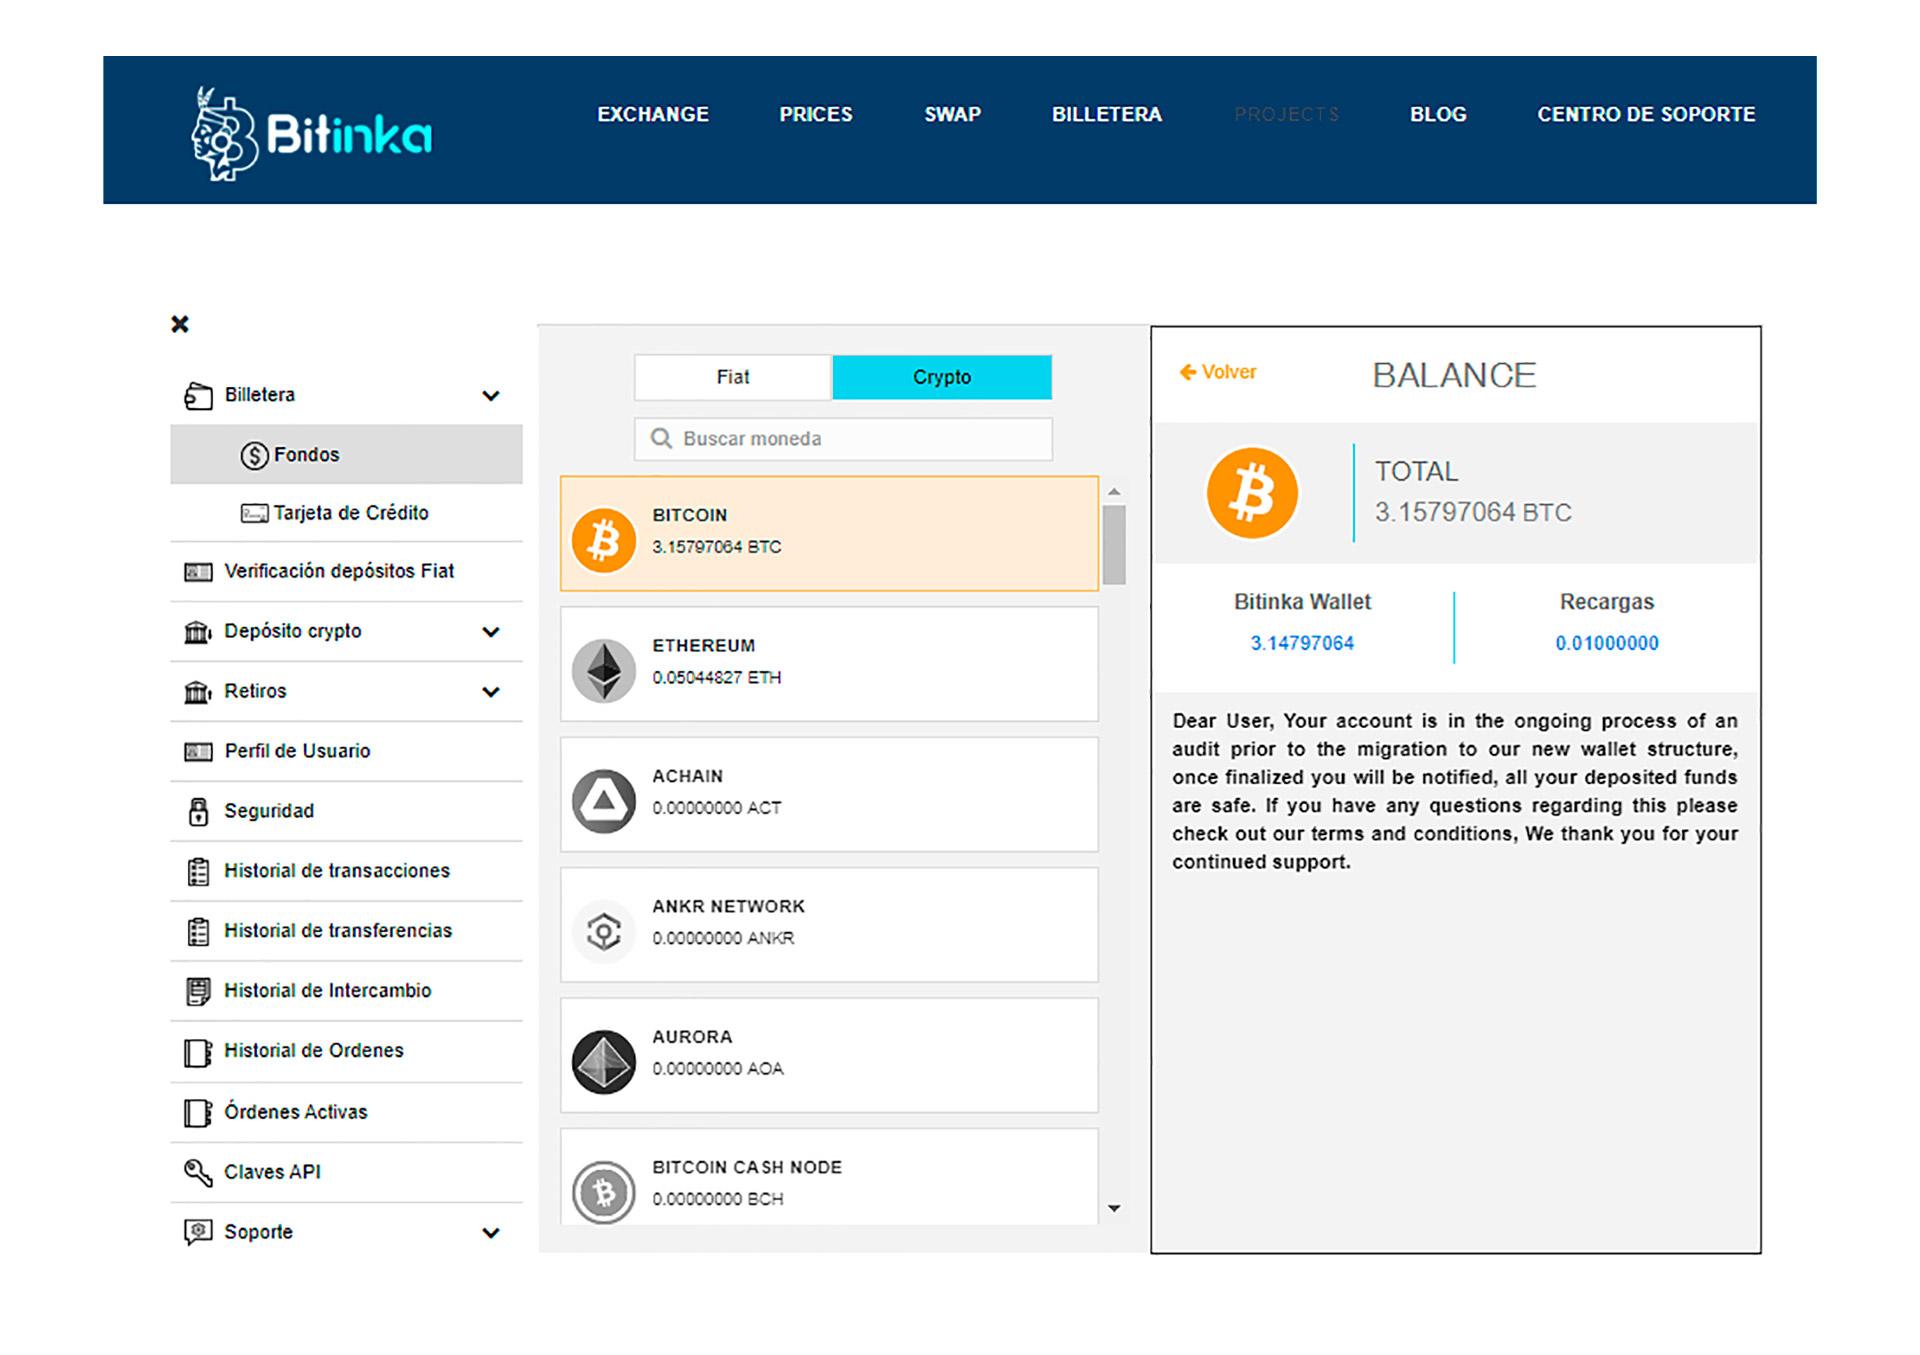 trgovac kripto orlandom tinejdžerski bitcoin milijunaš nova kripto valuta